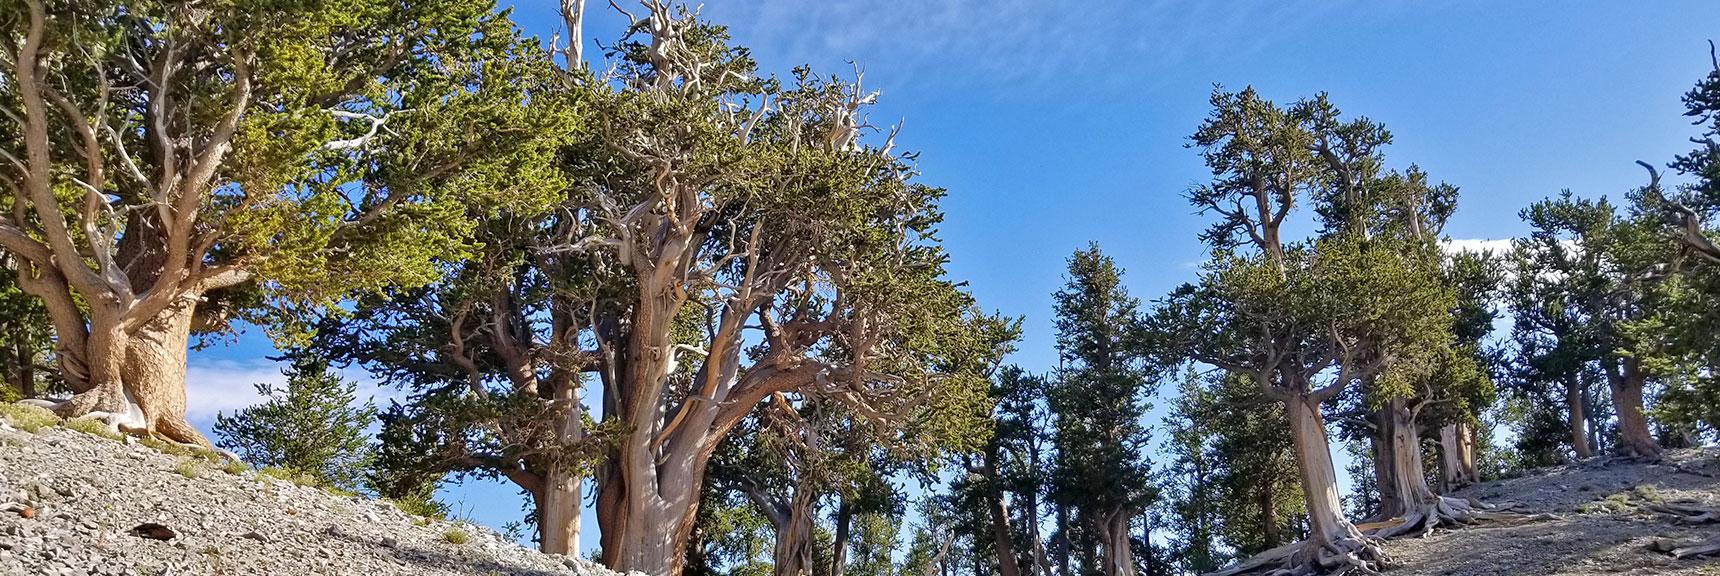 Arrival at Raintree on North Loop Trail | Mummy Mountain's Knees | Mt. Charleston Wilderness, Nevada 011